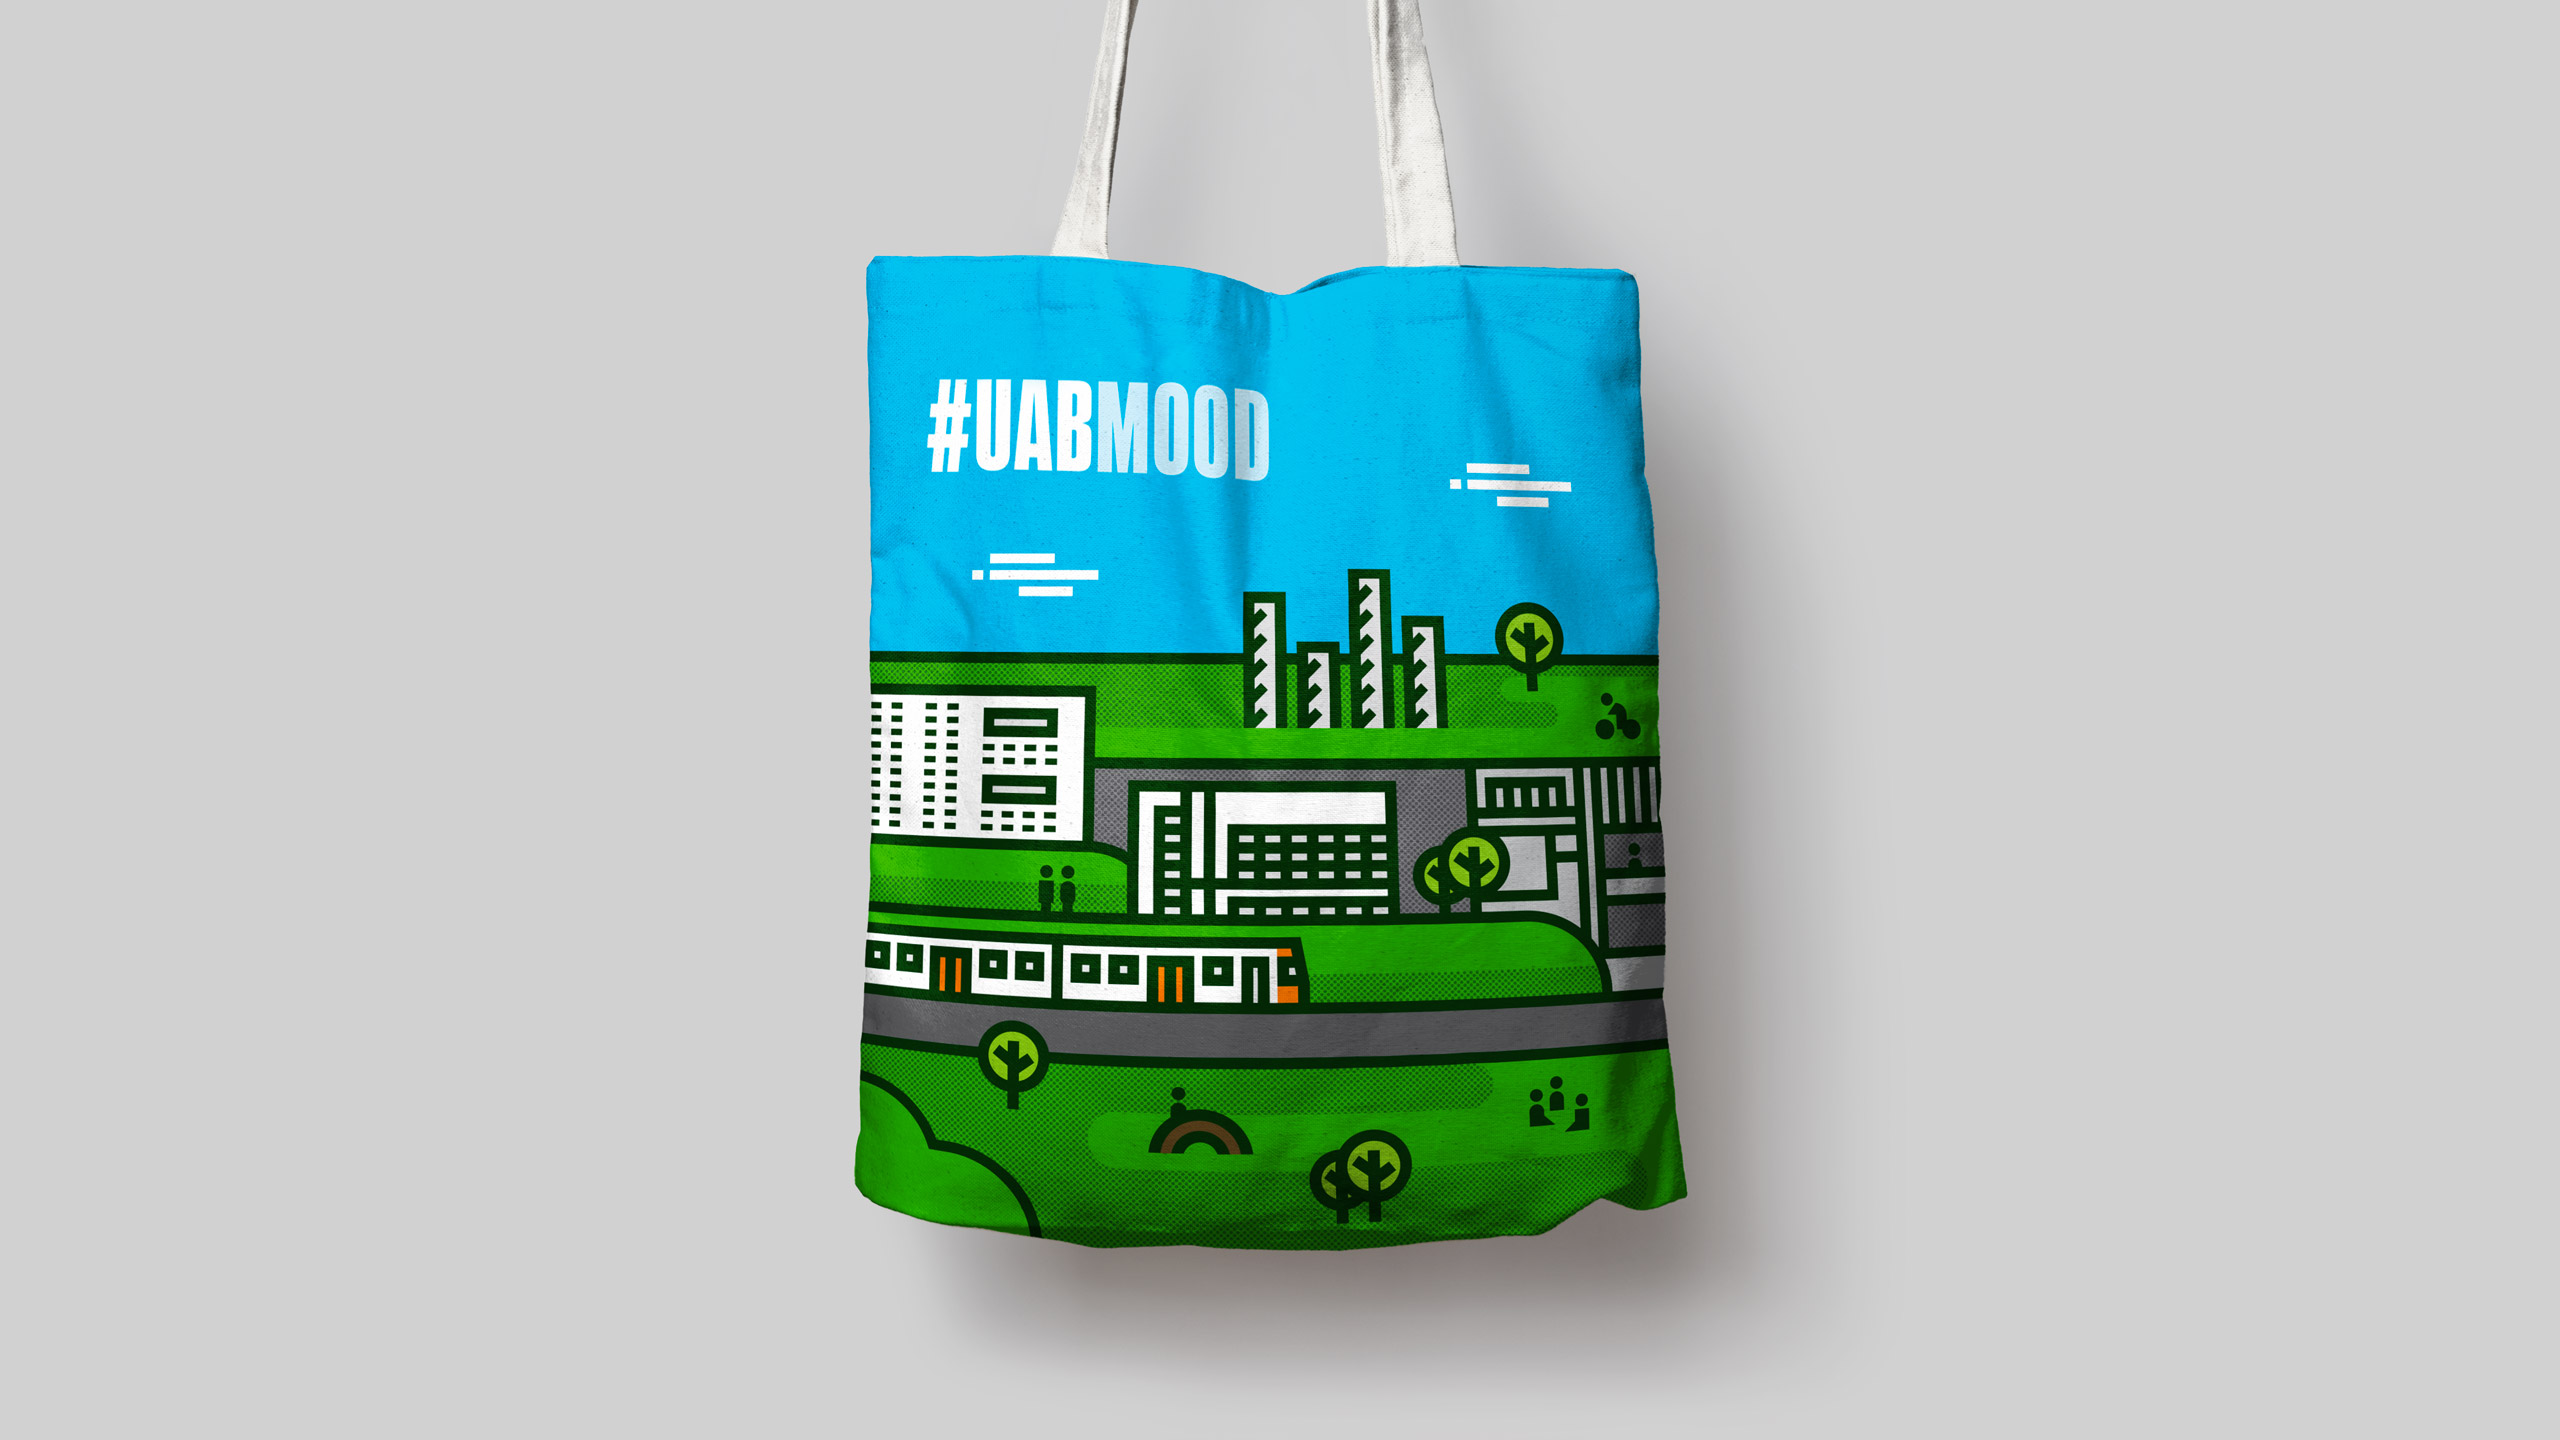 Bolsa UABmood diseñada por mètode